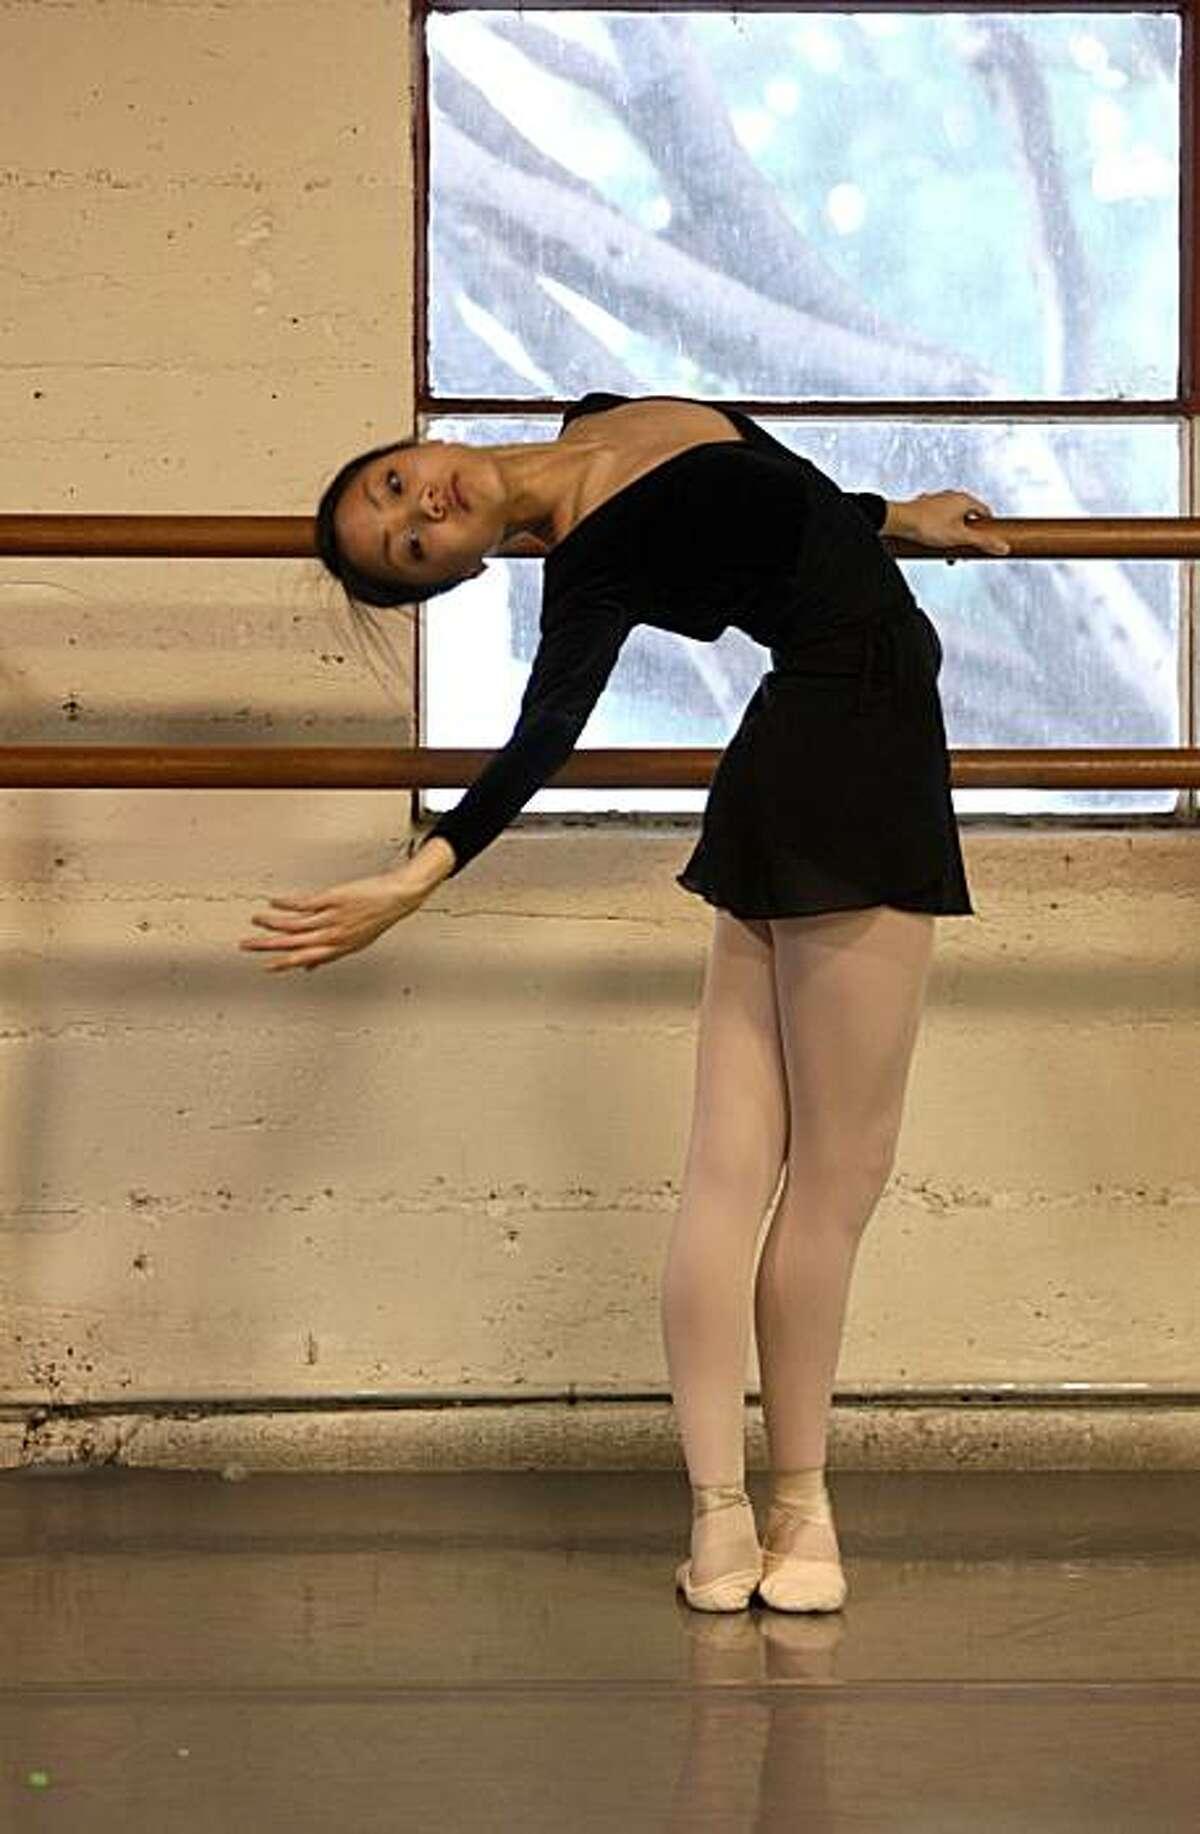 Jeraldine Mendoza takes a ballet class at the City Ballet School with City Ballet School resident choreographer Yuri Zhukov (not shown) in San Francisco, Calif. on Tuesday January 6, 2010.